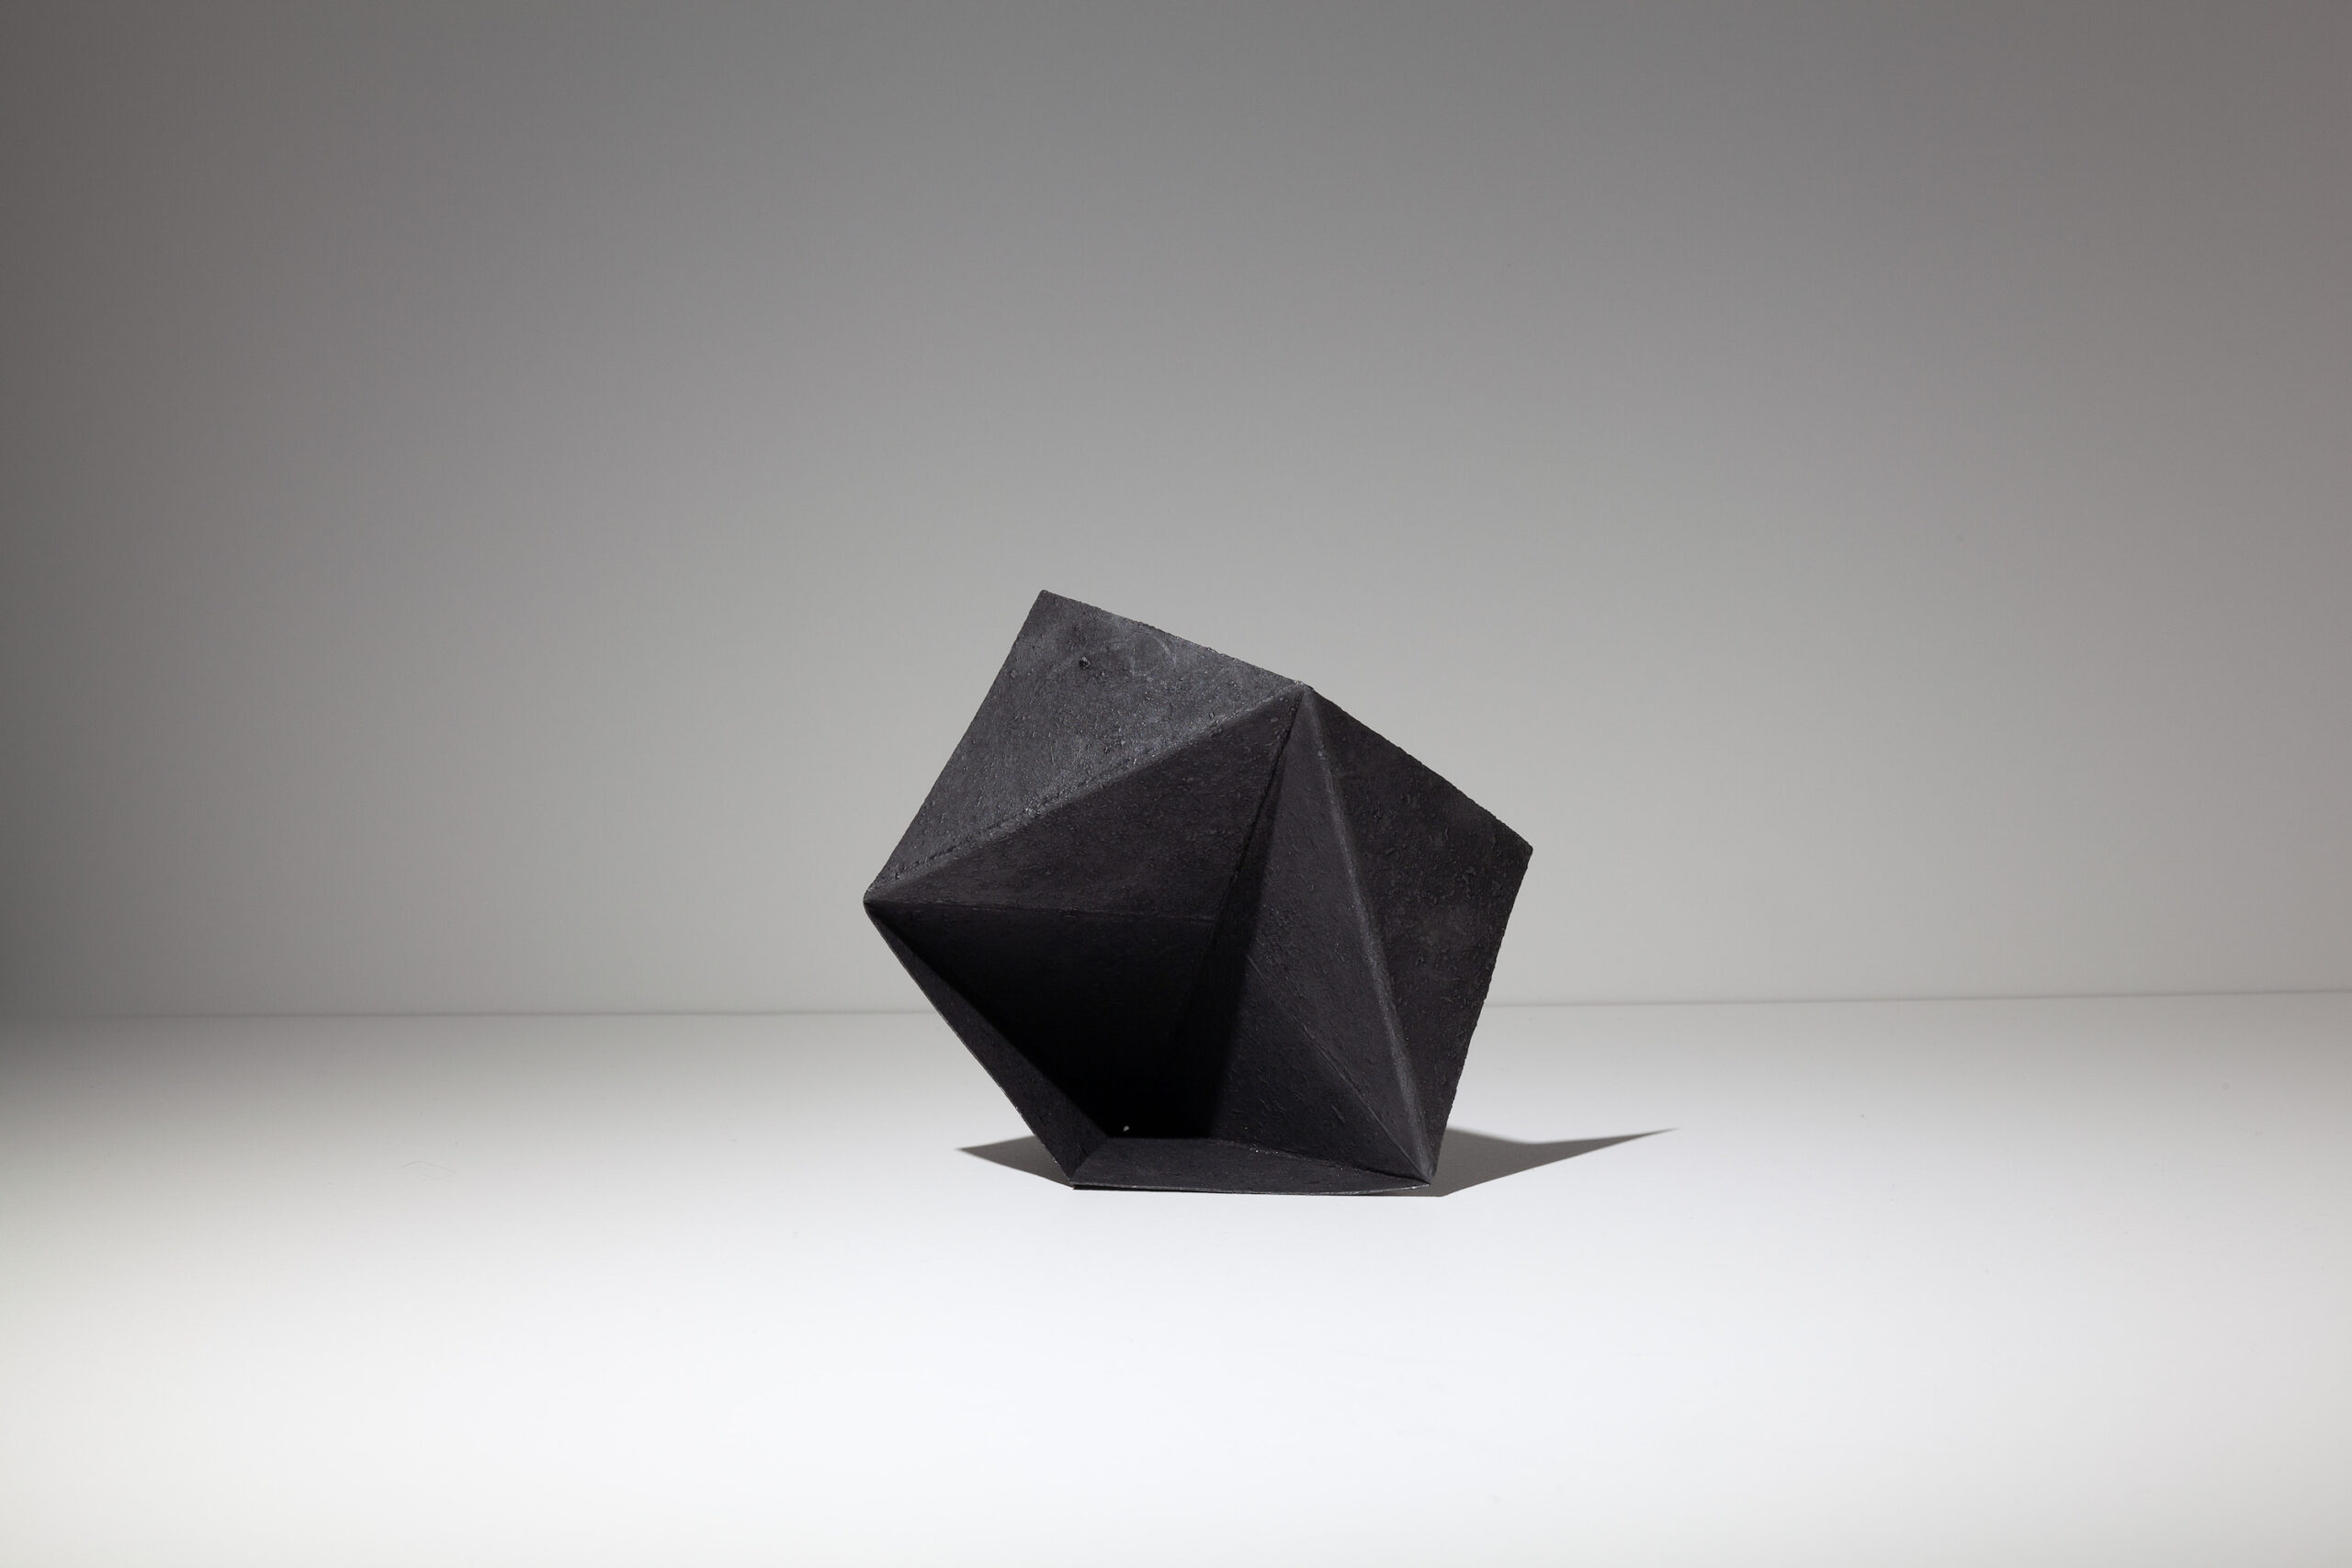 Felecia Chizuko Carlisle, Hexahedron, 2020